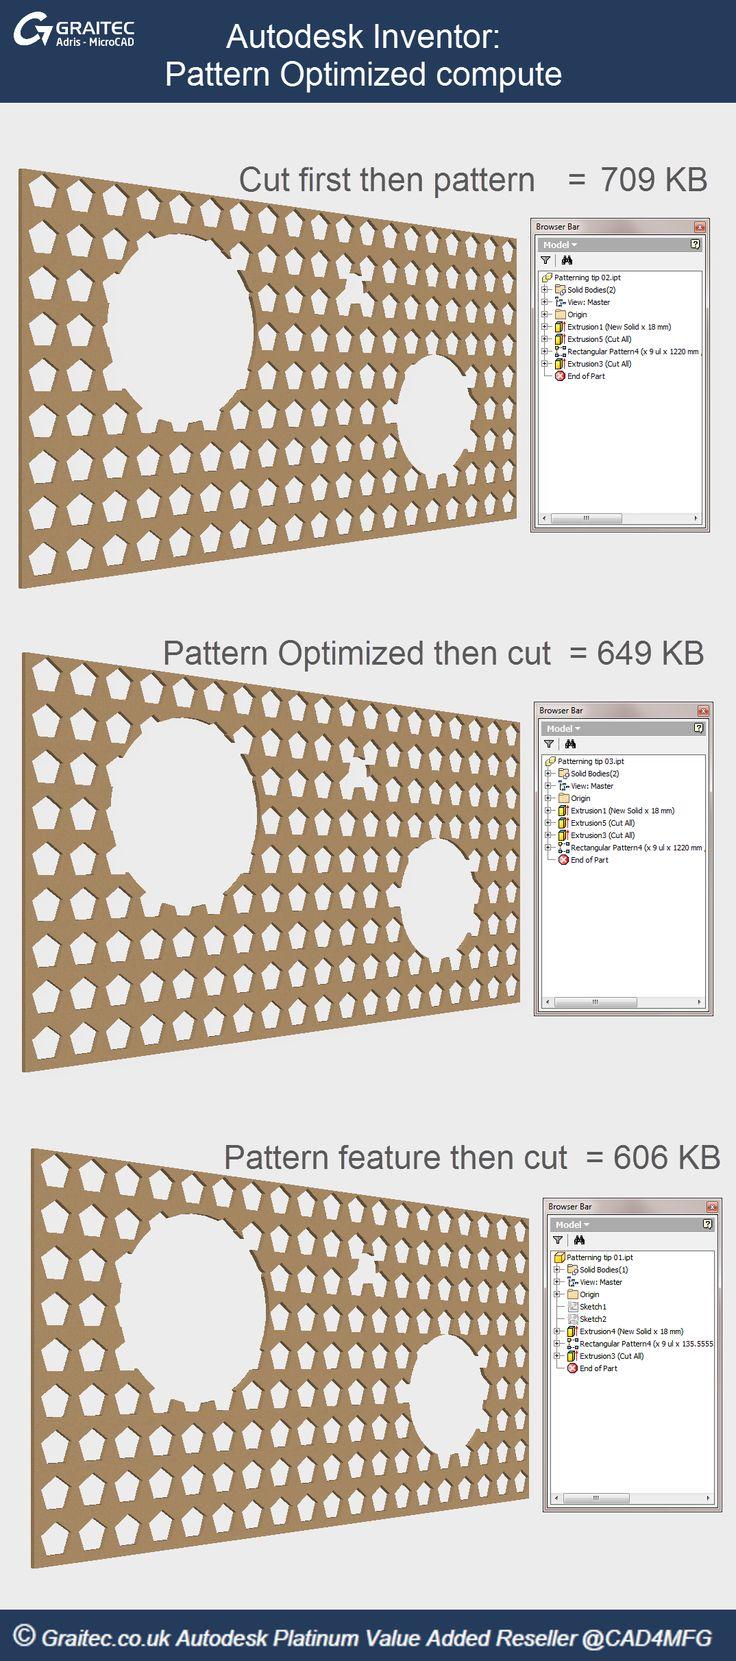 Autodesk Inventor: Pattern Optimized Compute